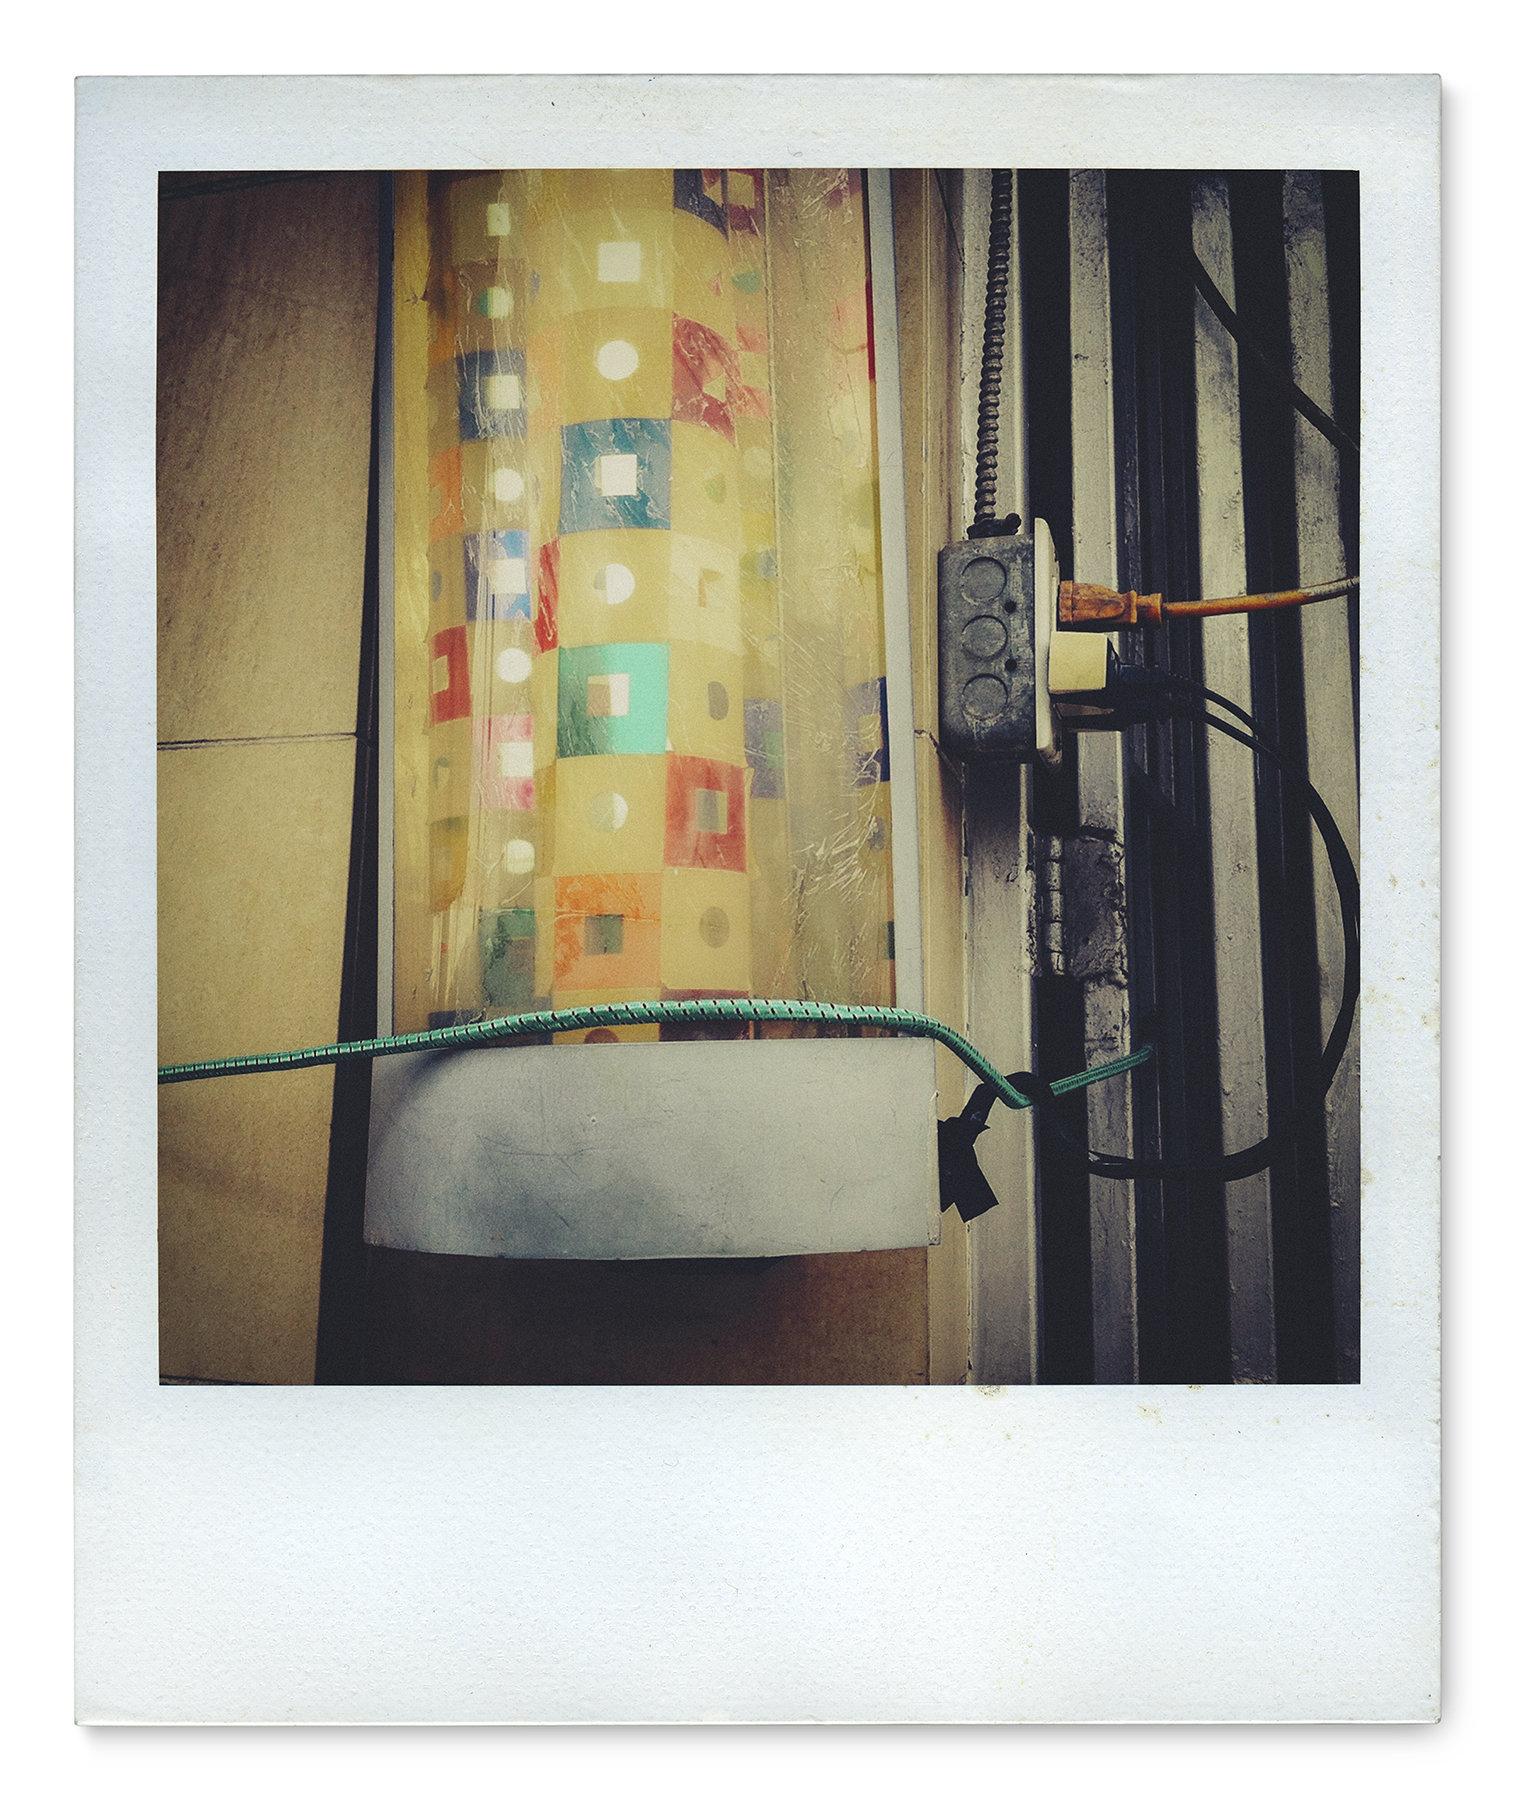 037_Polaroid SX70_IMG_5211.jpg